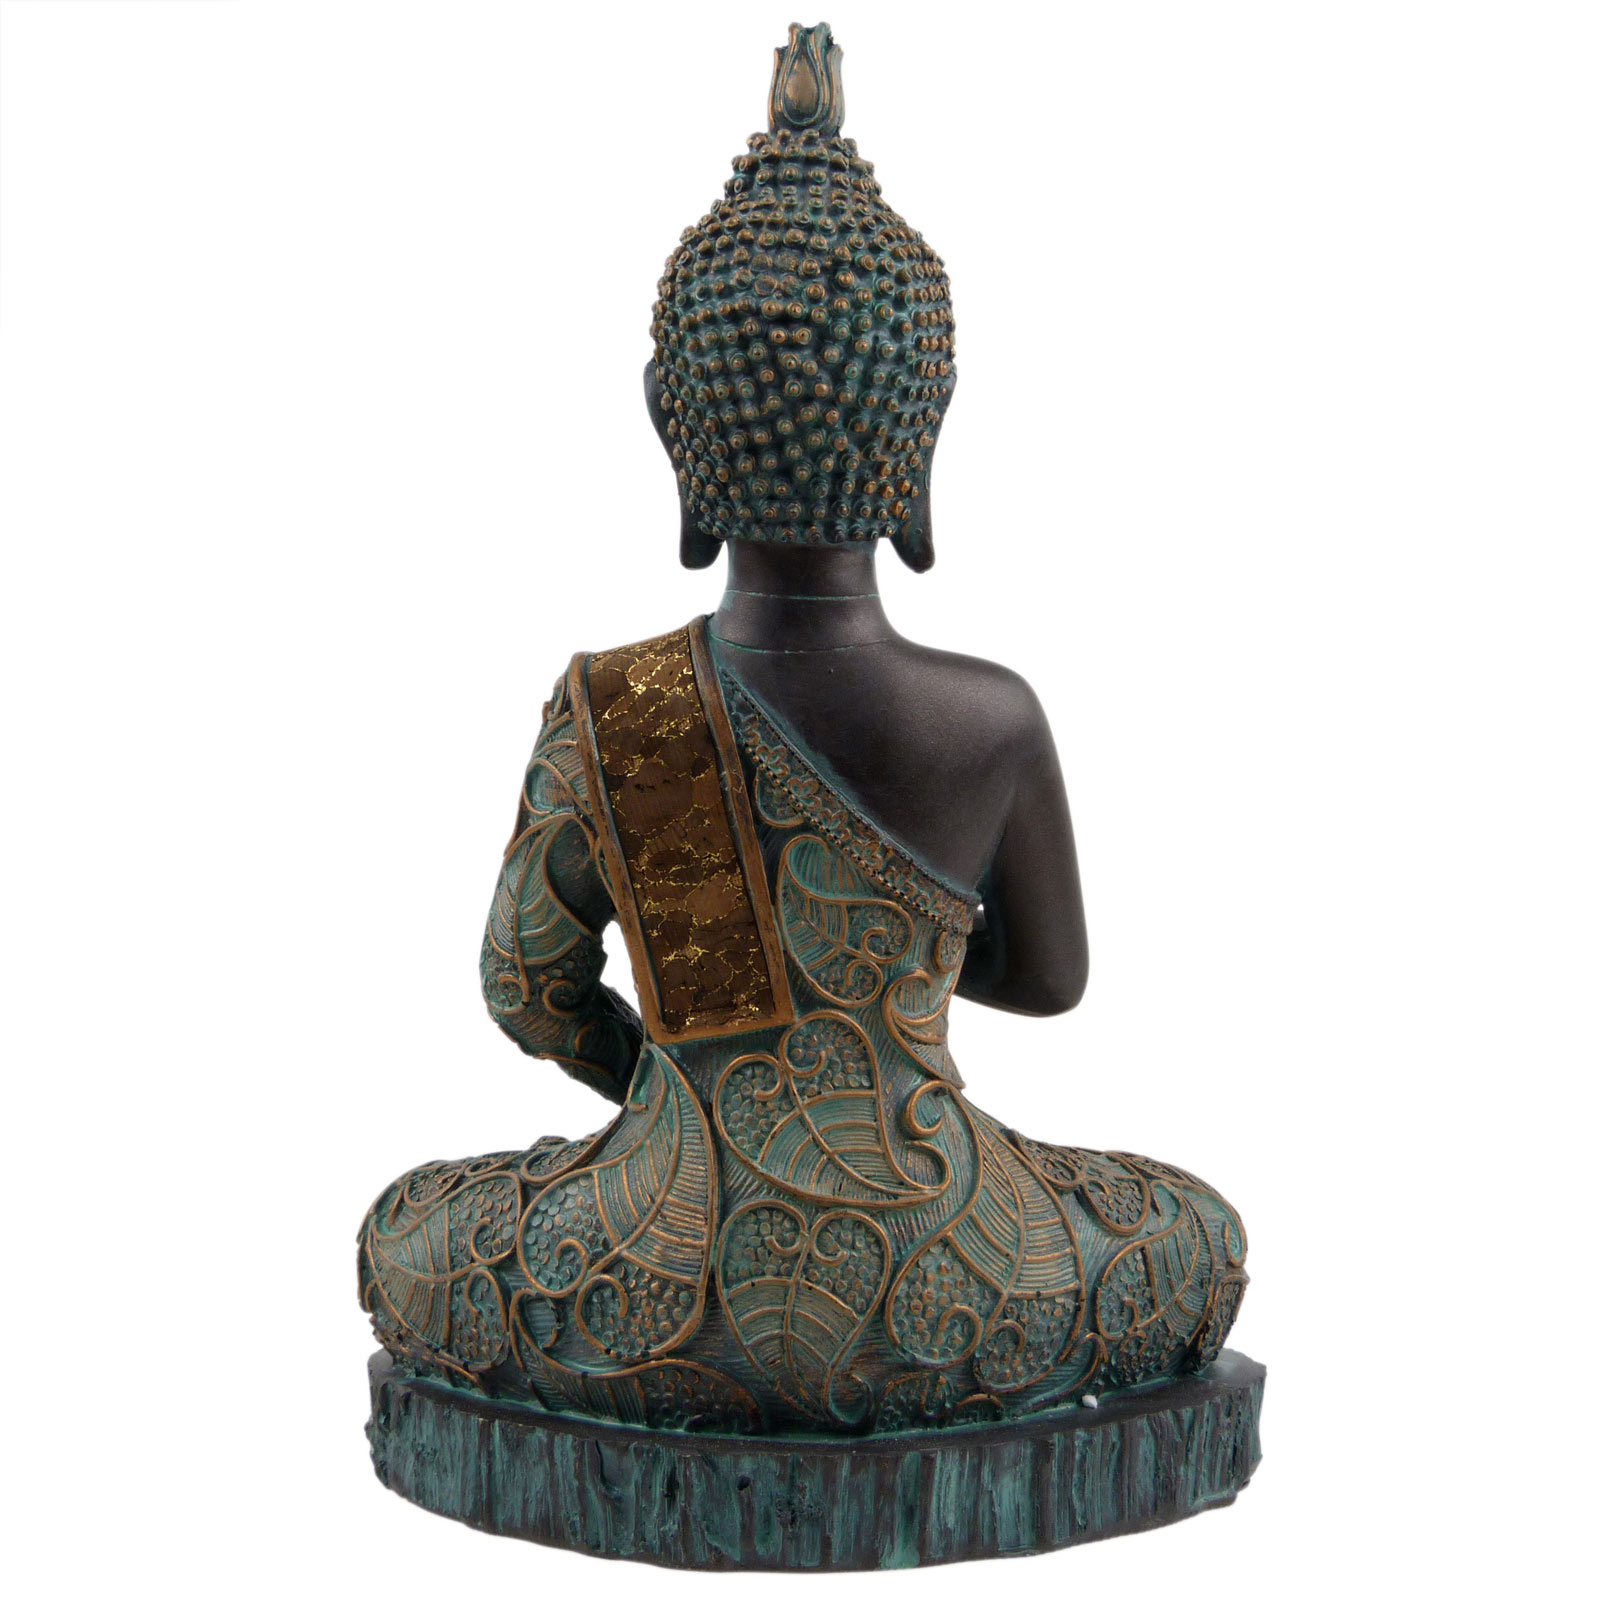 Verdin-Buda-Tailandes-23cm-Alto-4-Disenos-Meditacion-Mindfulness-Metta miniatura 6